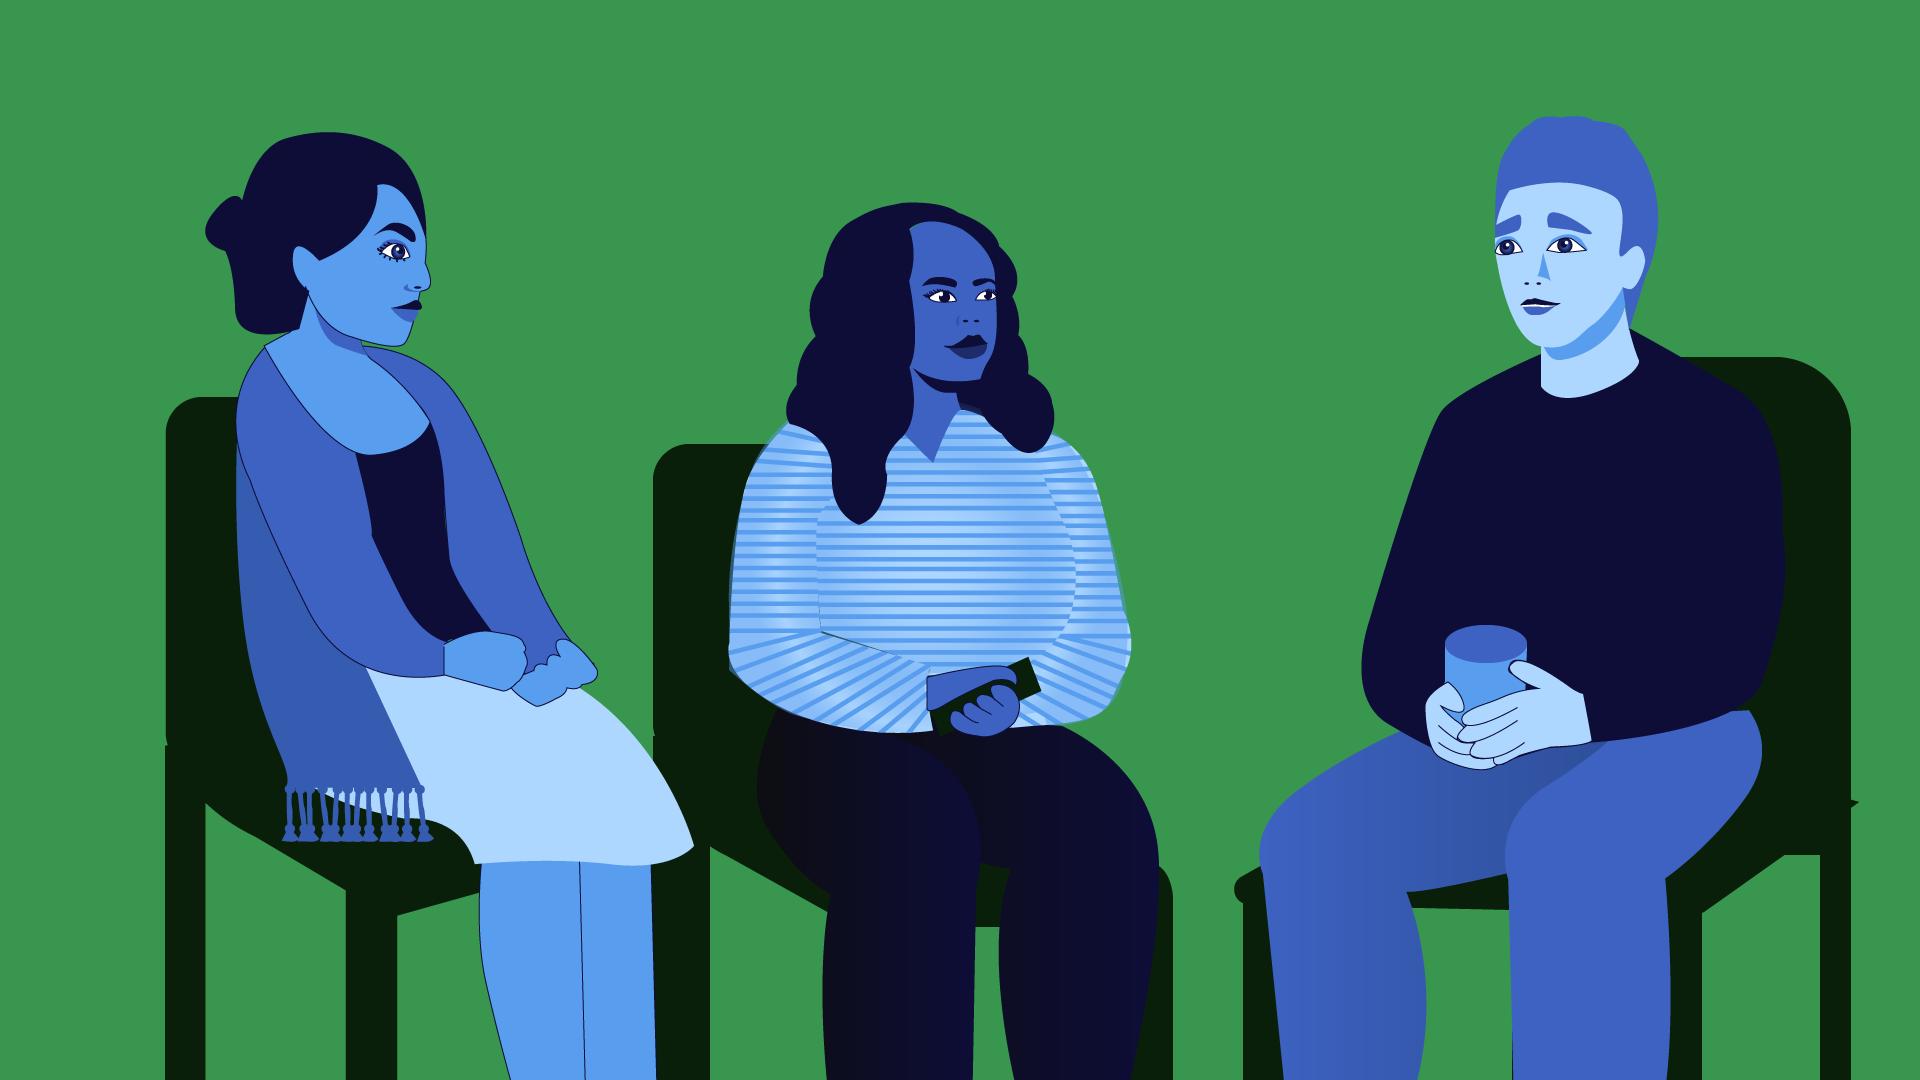 Cartoon of three students sat together